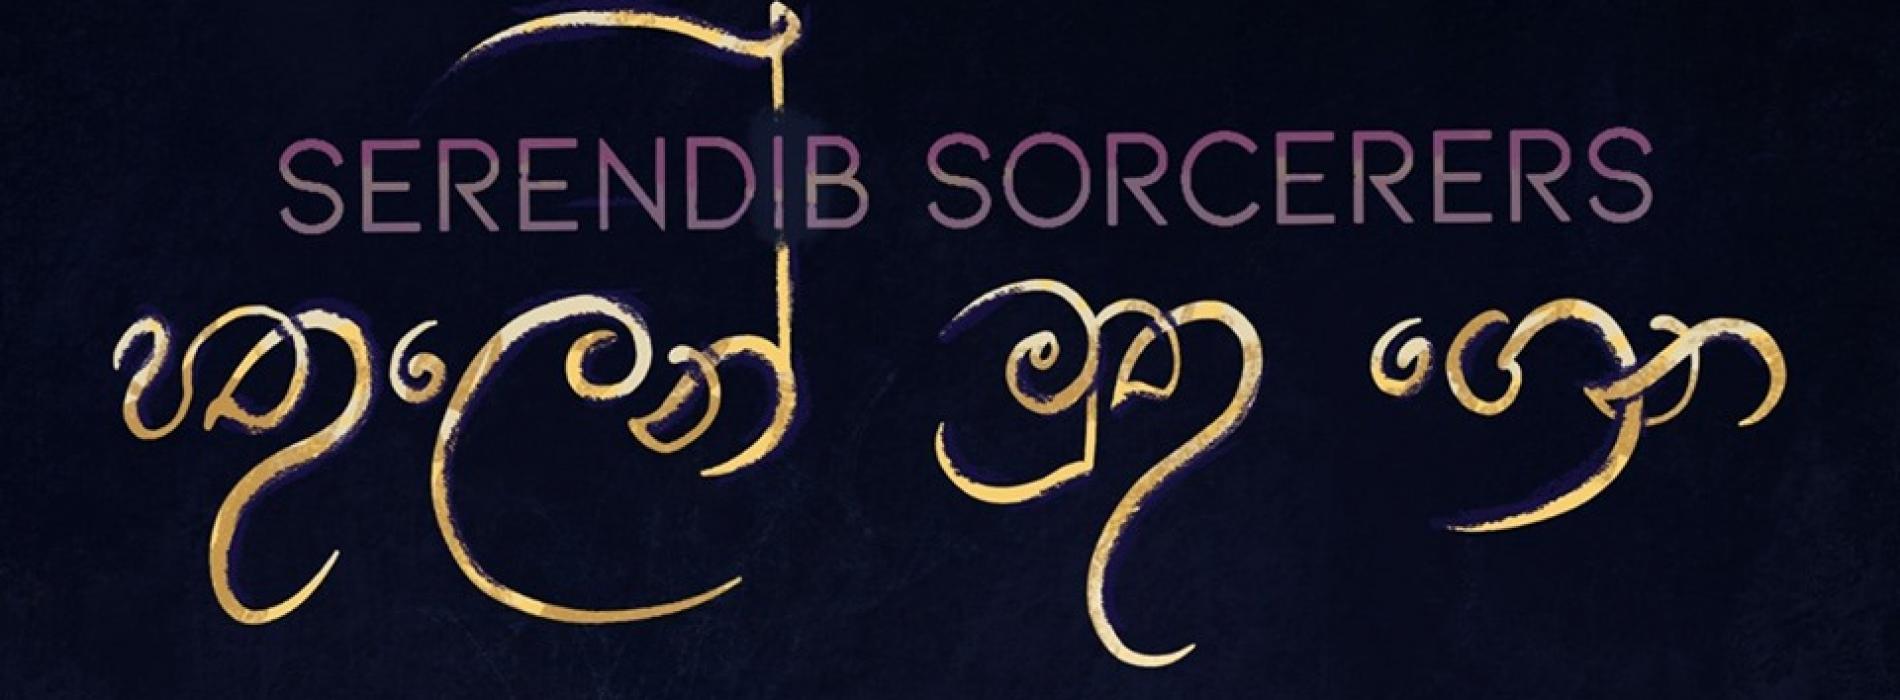 Serendib Sorcerers පතුලෙන් මුතු ගෙන Album Launch